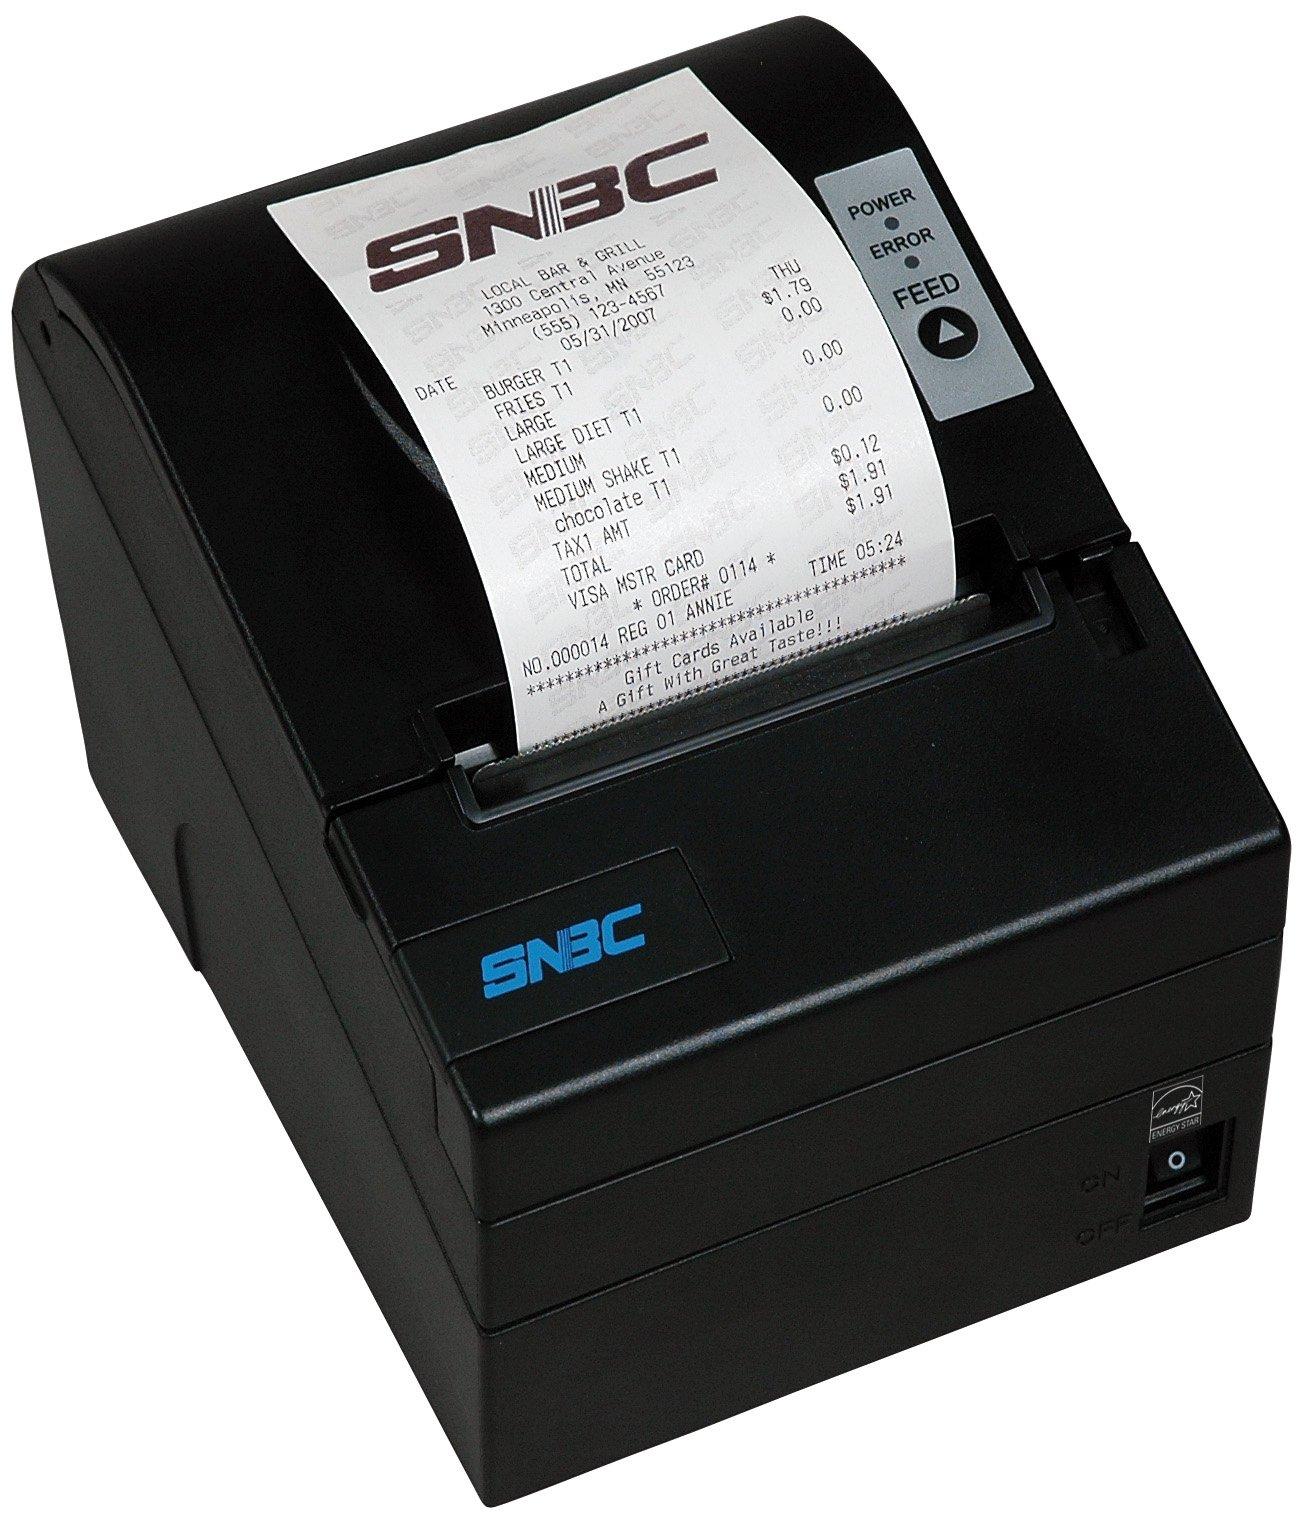 SNBC BTP-R880NP Ethernet/USB Thermal Receipt Printer